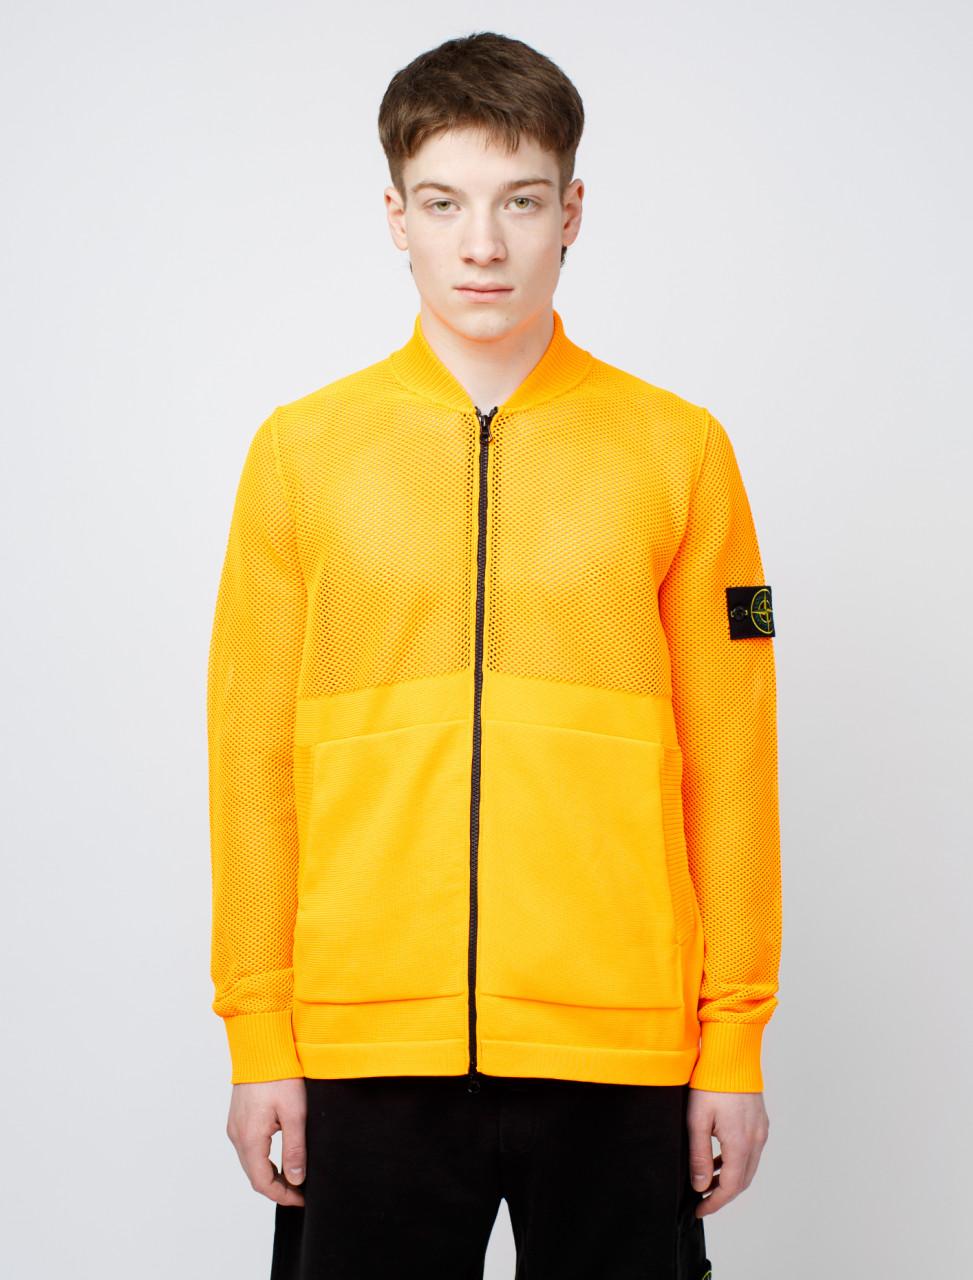 SI Orange Knit Jacket